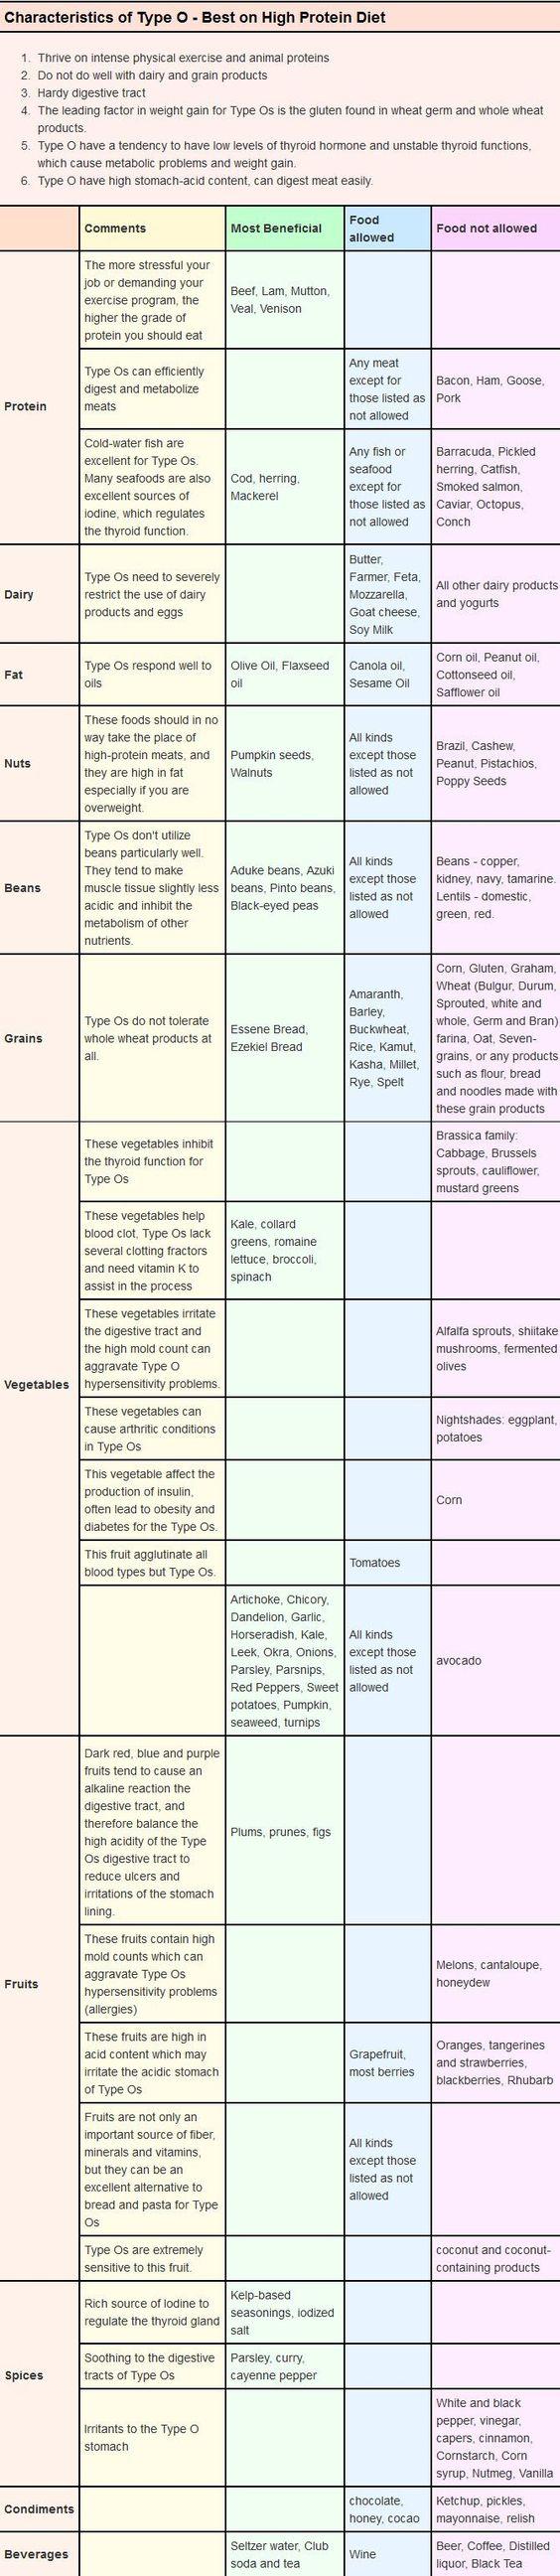 #BloodTypediet Blood type O Diet Food List  http://slimcelebrity.com/diets/blood-type-o-diet-food-list/